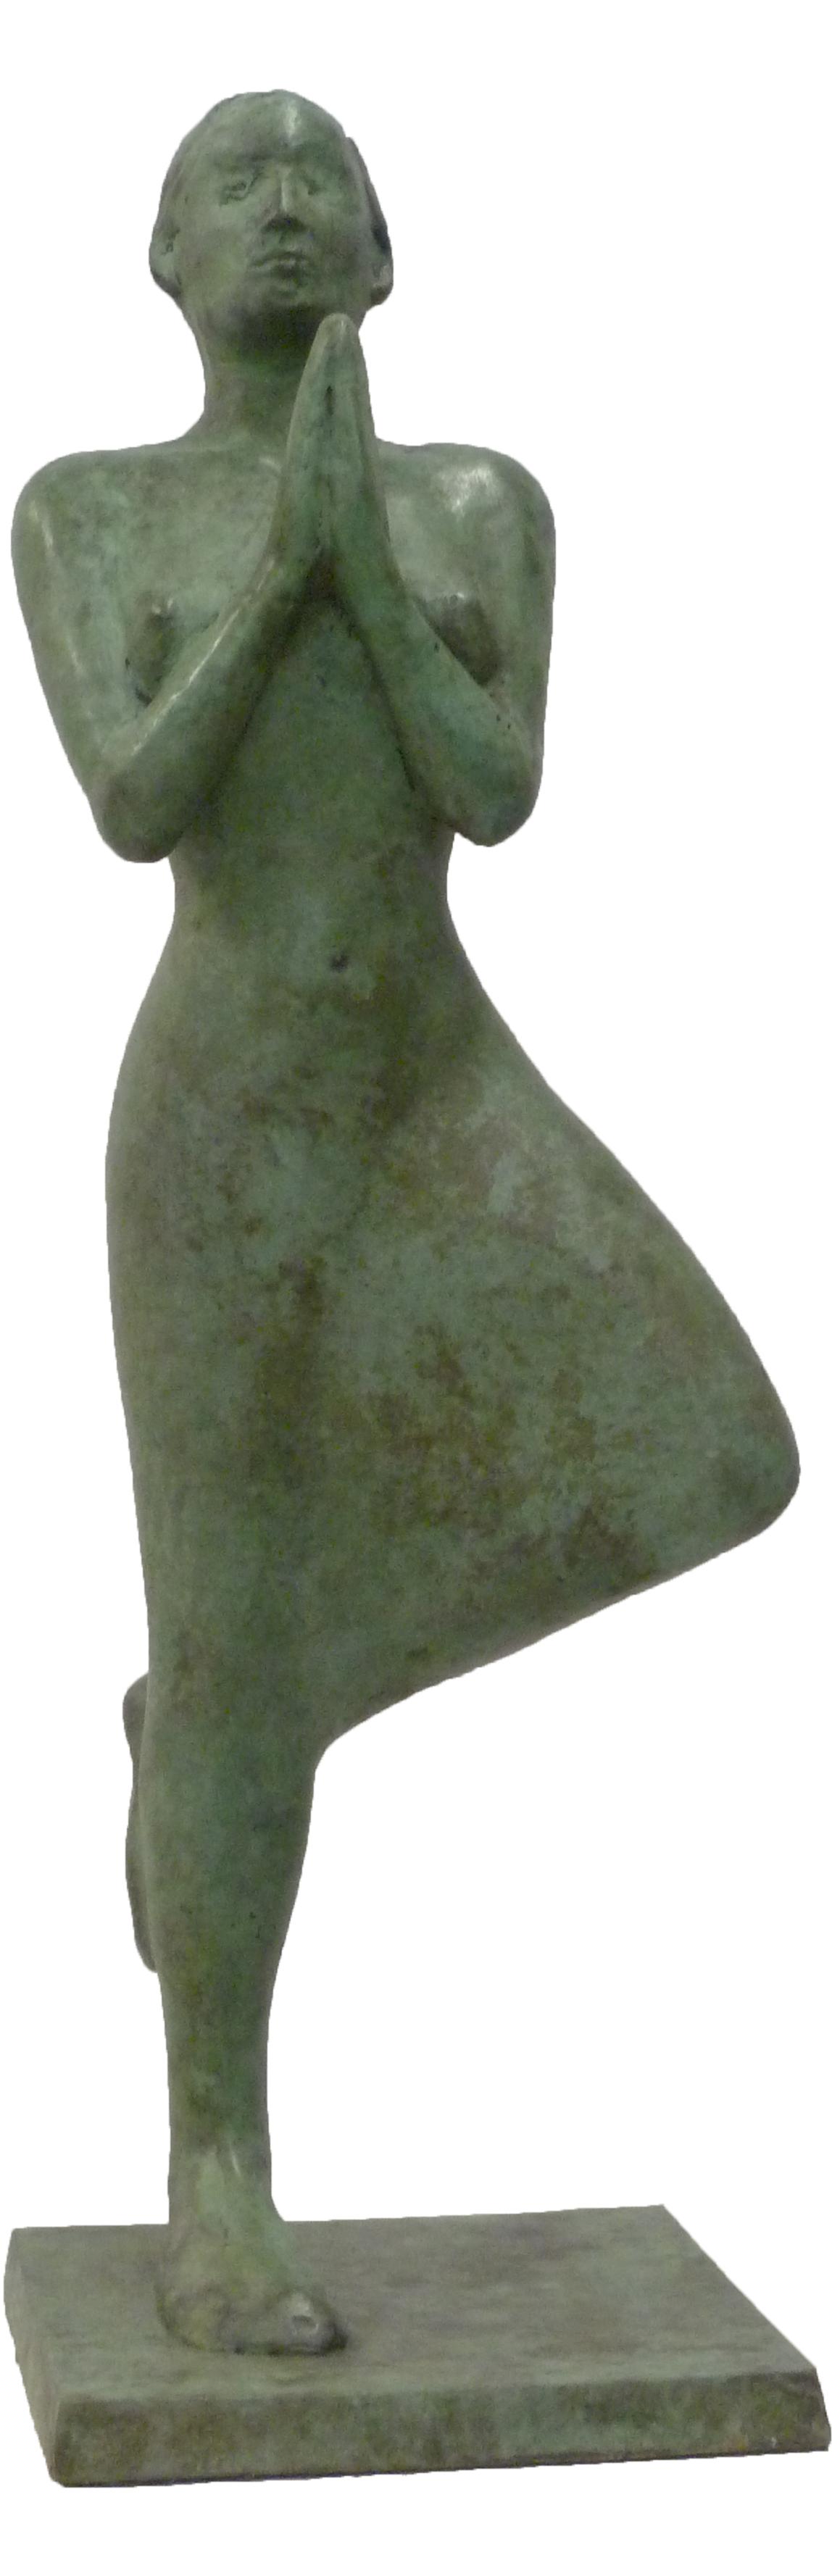 'Lady in a Meditative Pose', Bronze, edt of 12, 43cm x 13cm x 13cm, E2200